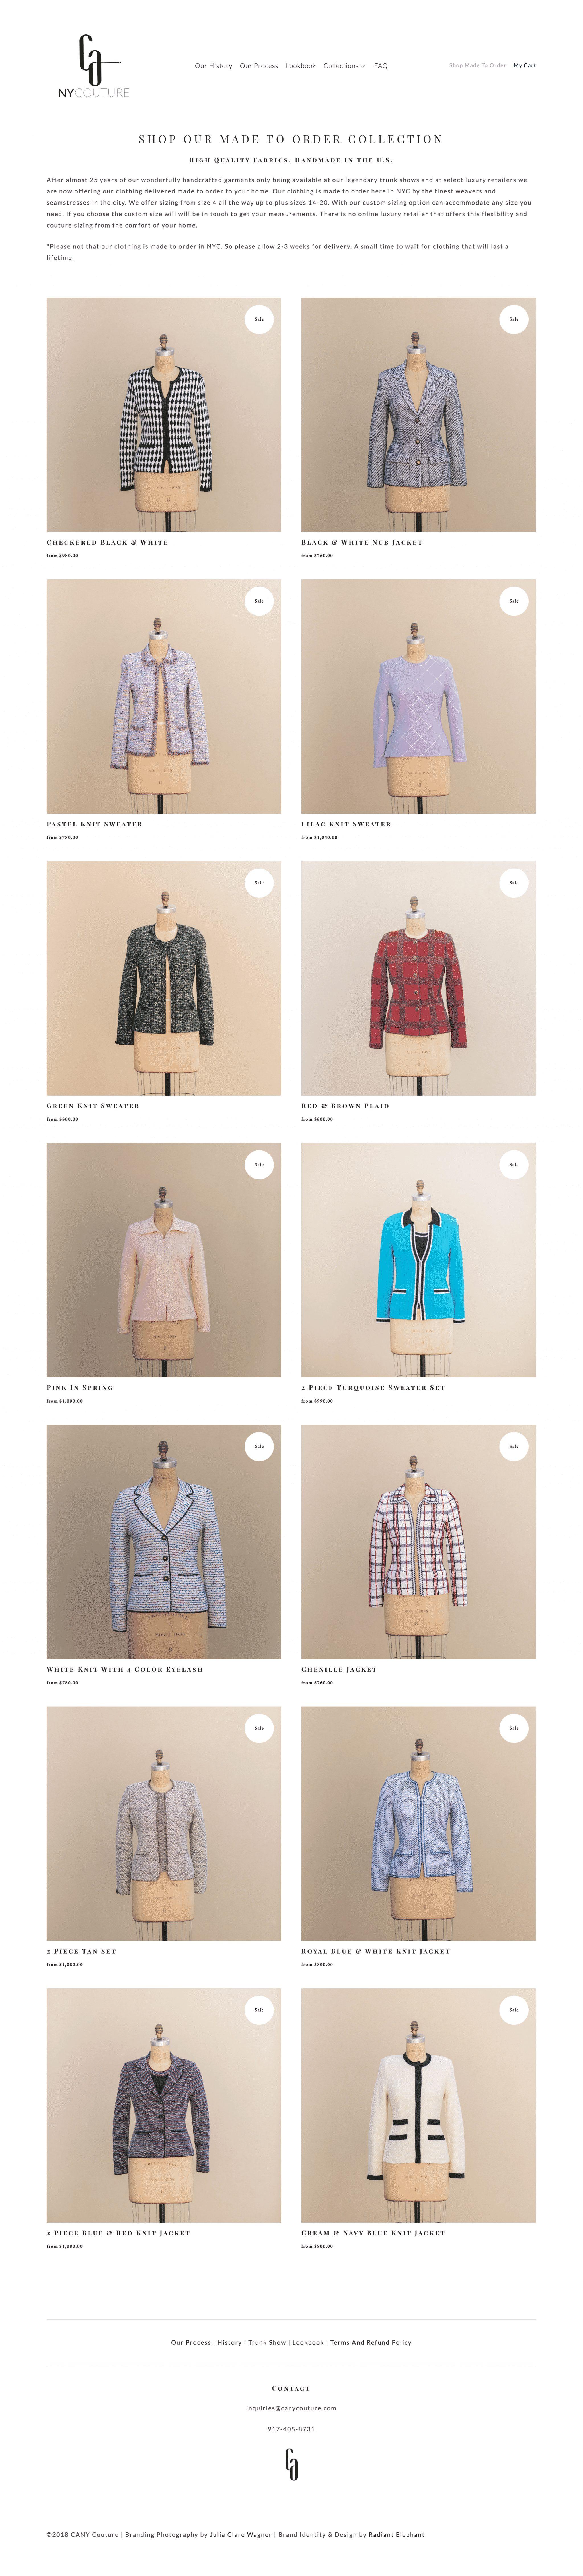 nj-fashion-web-design